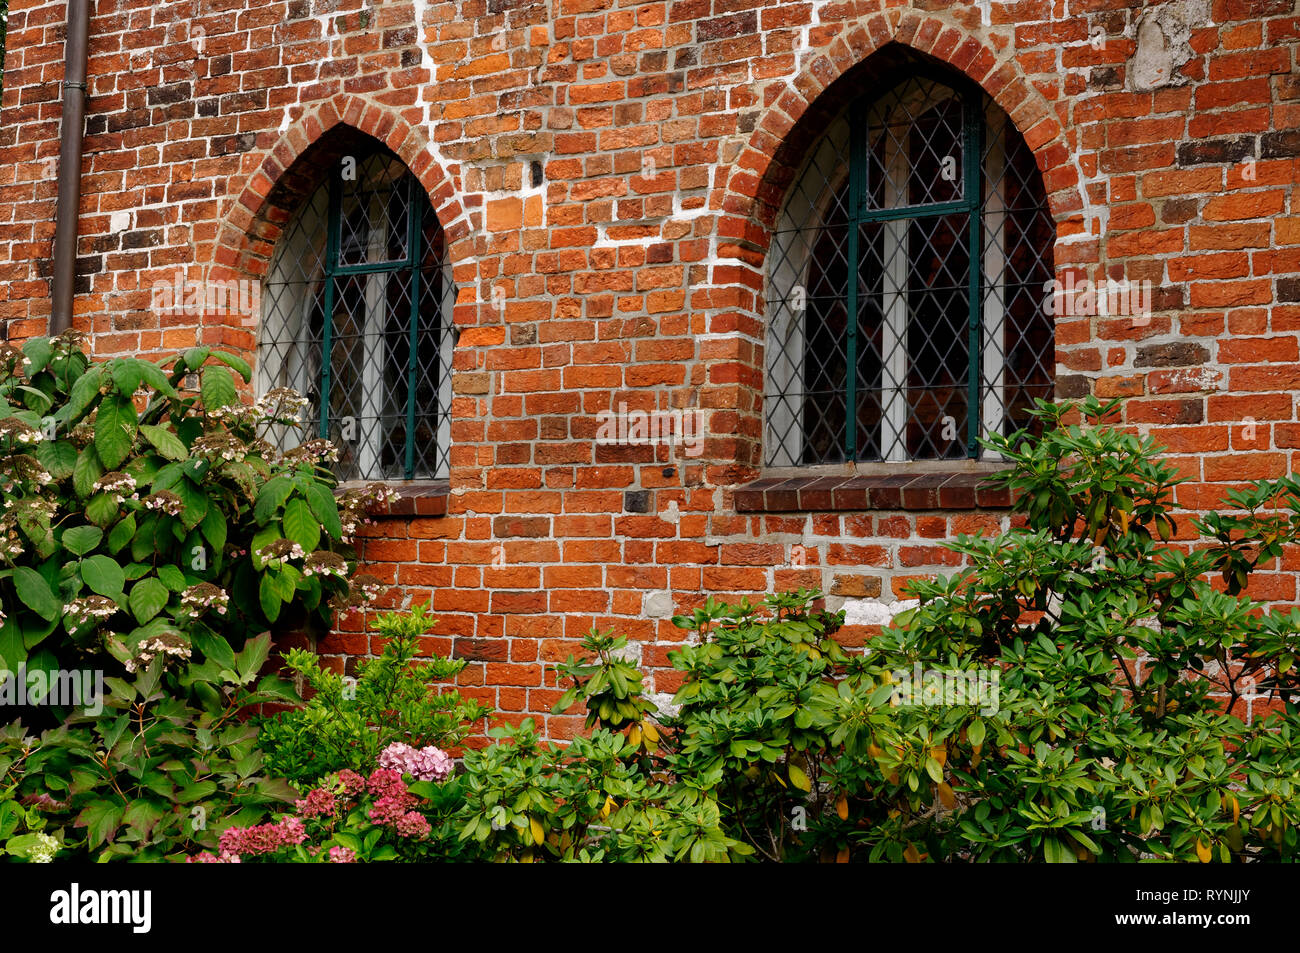 Lüne Abbey in Lüneburg: 2 windows (brick gothic), Lower Saxony, Germany - Stock Image